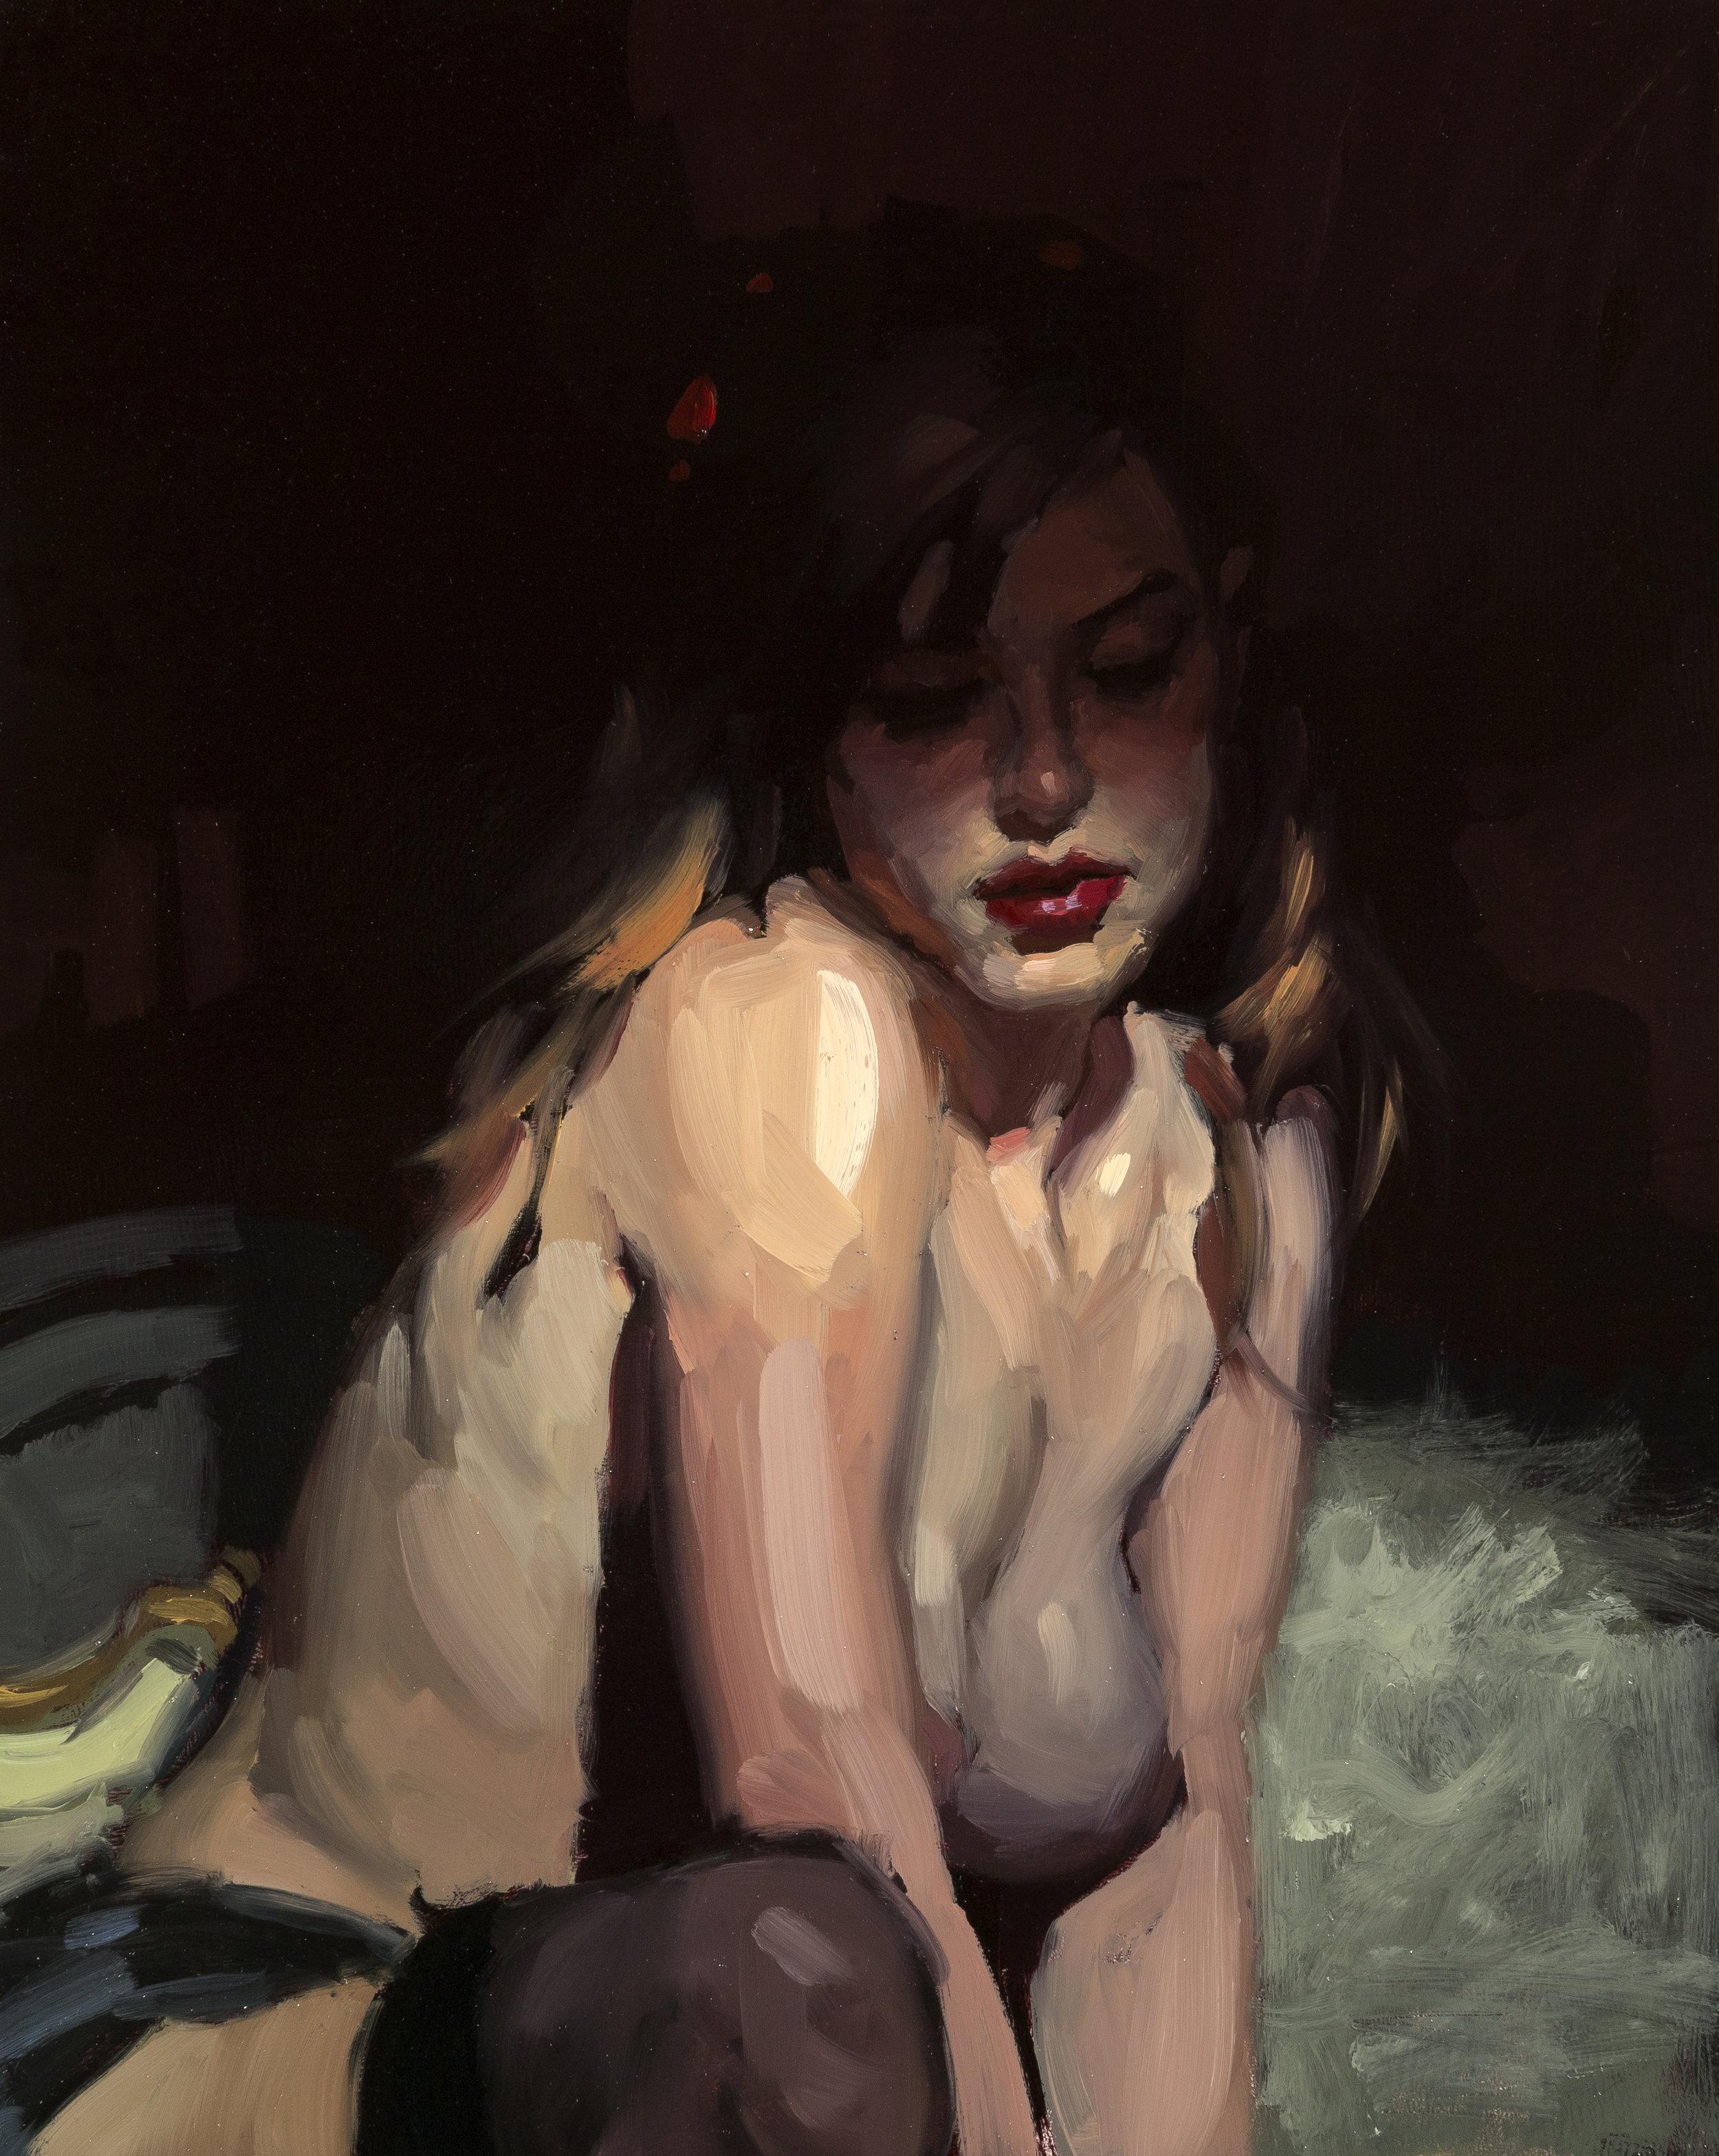 Tonal Study, Amanda - 8 x 10 inches - Oil on Panel - Jun-15